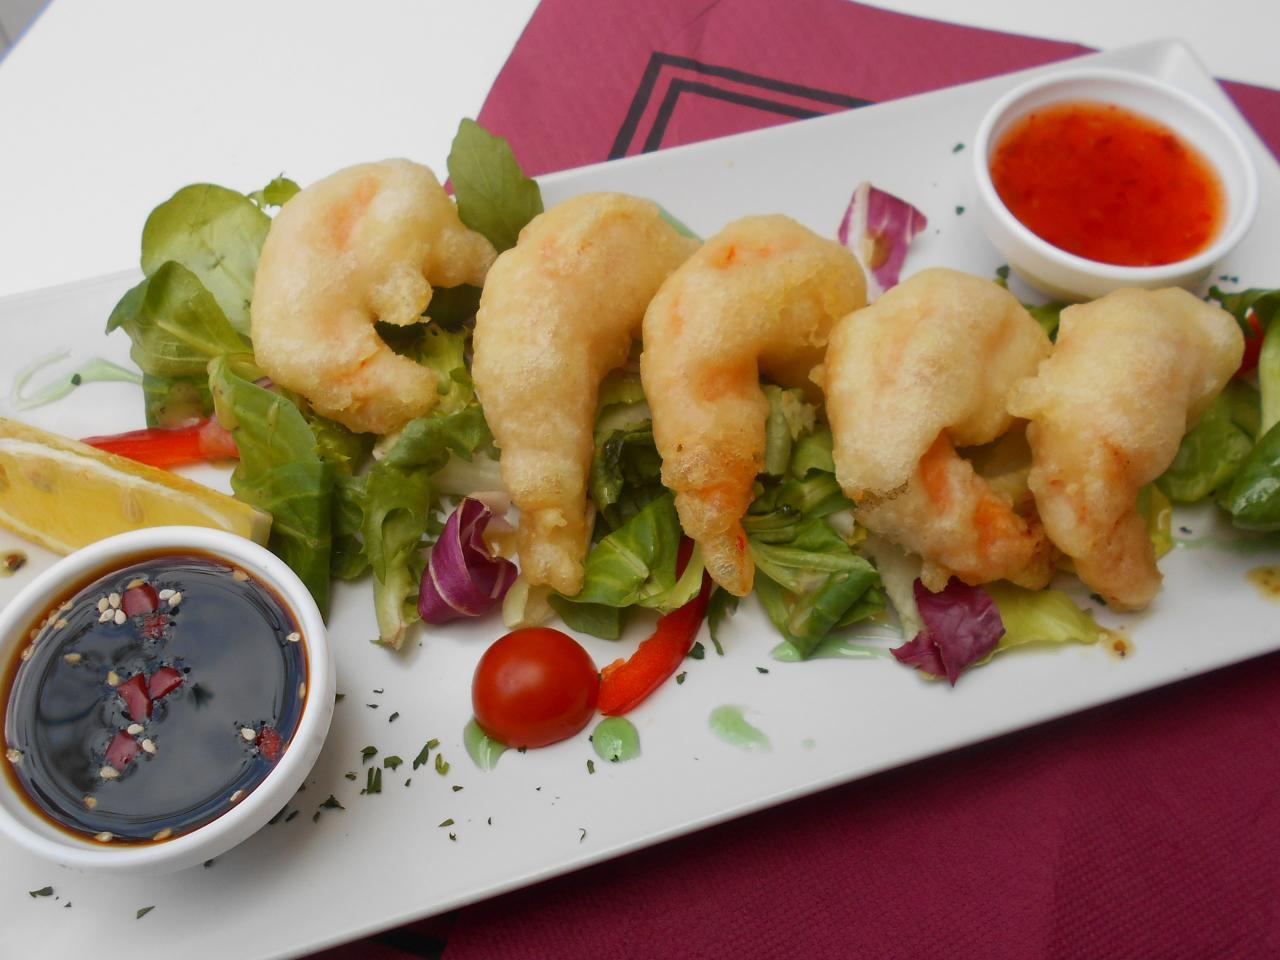 The tempura langostinos were worth a 10-rating